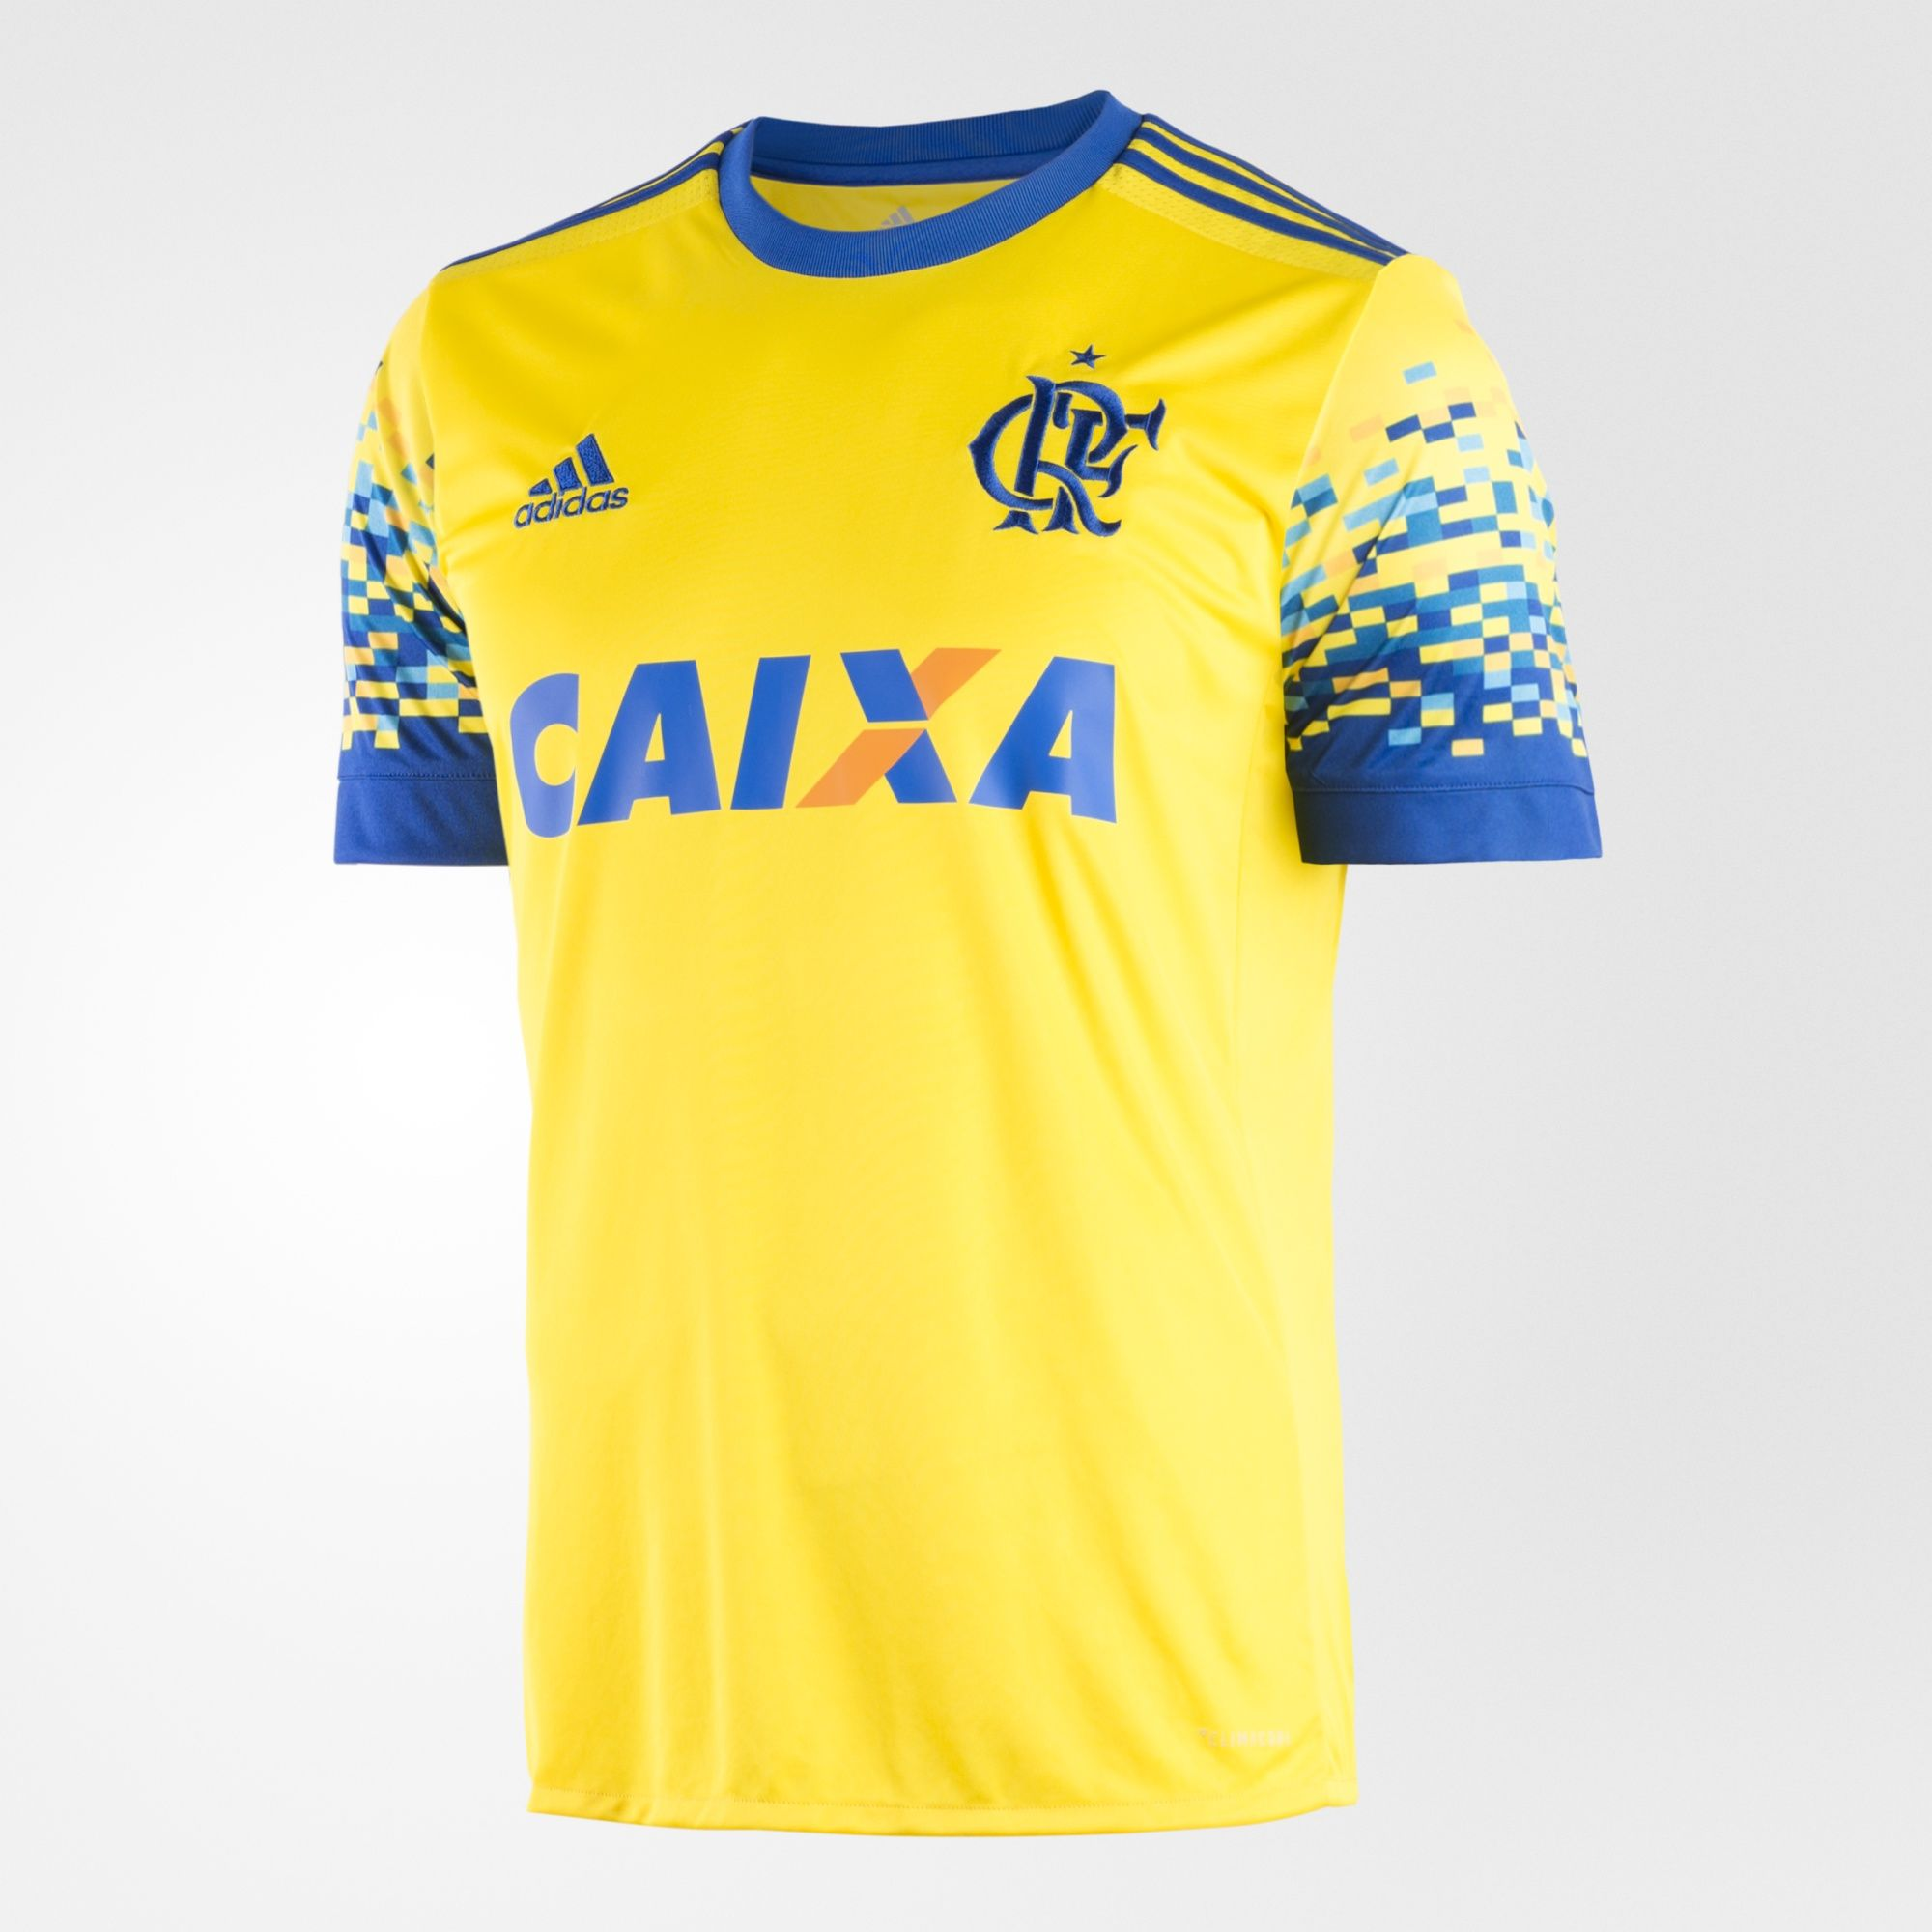 camisa do flamengo 3 2017 adidas masculina.